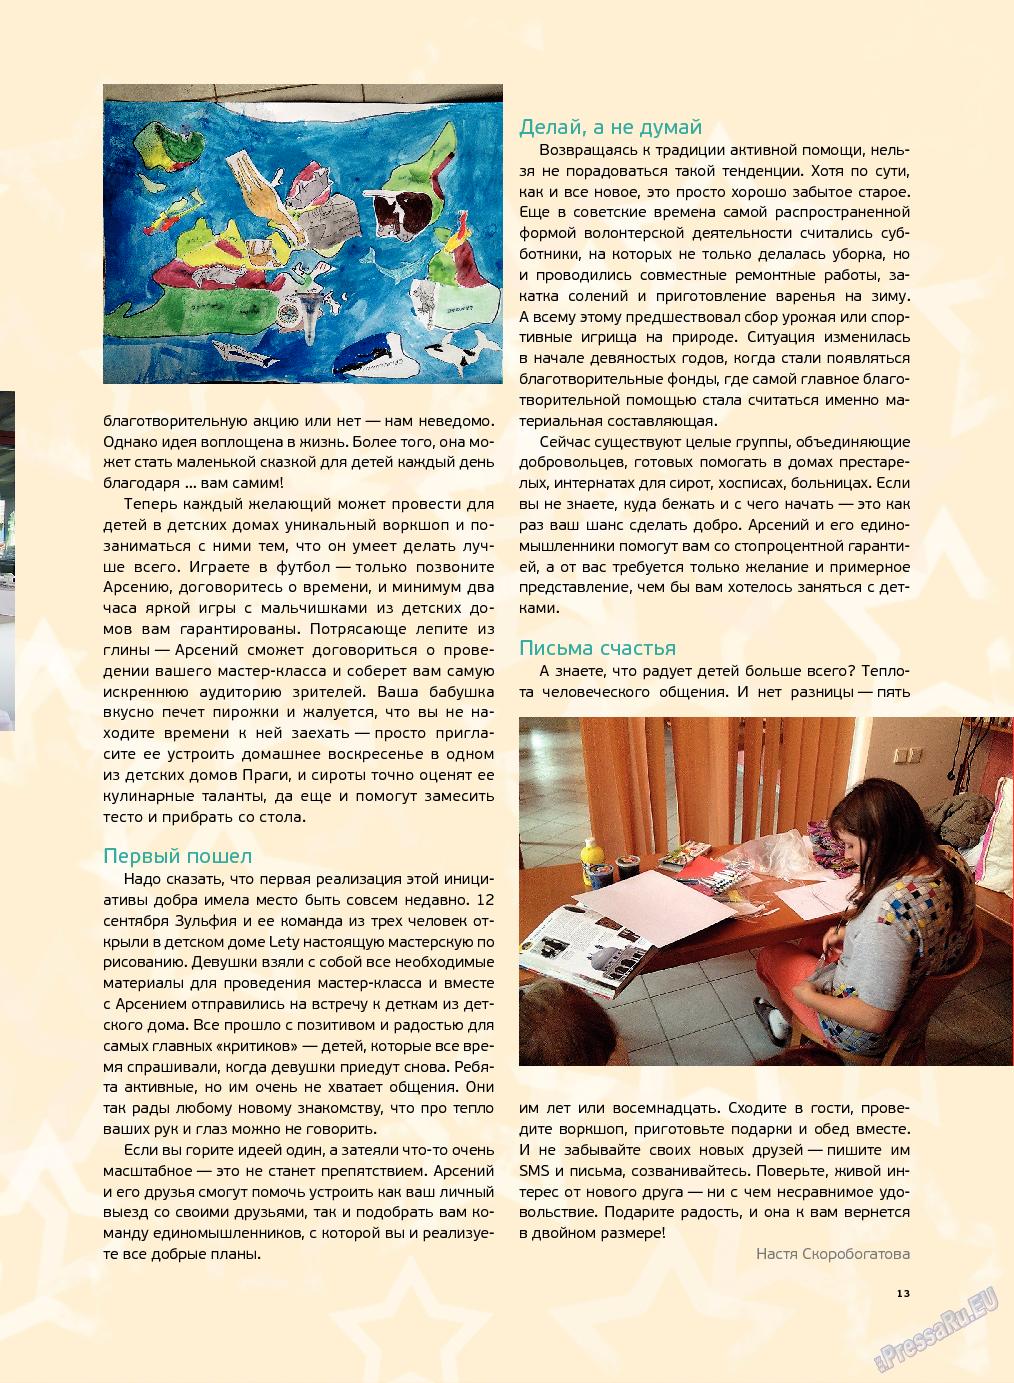 Артек (журнал). 2013 год, номер 4, стр. 15